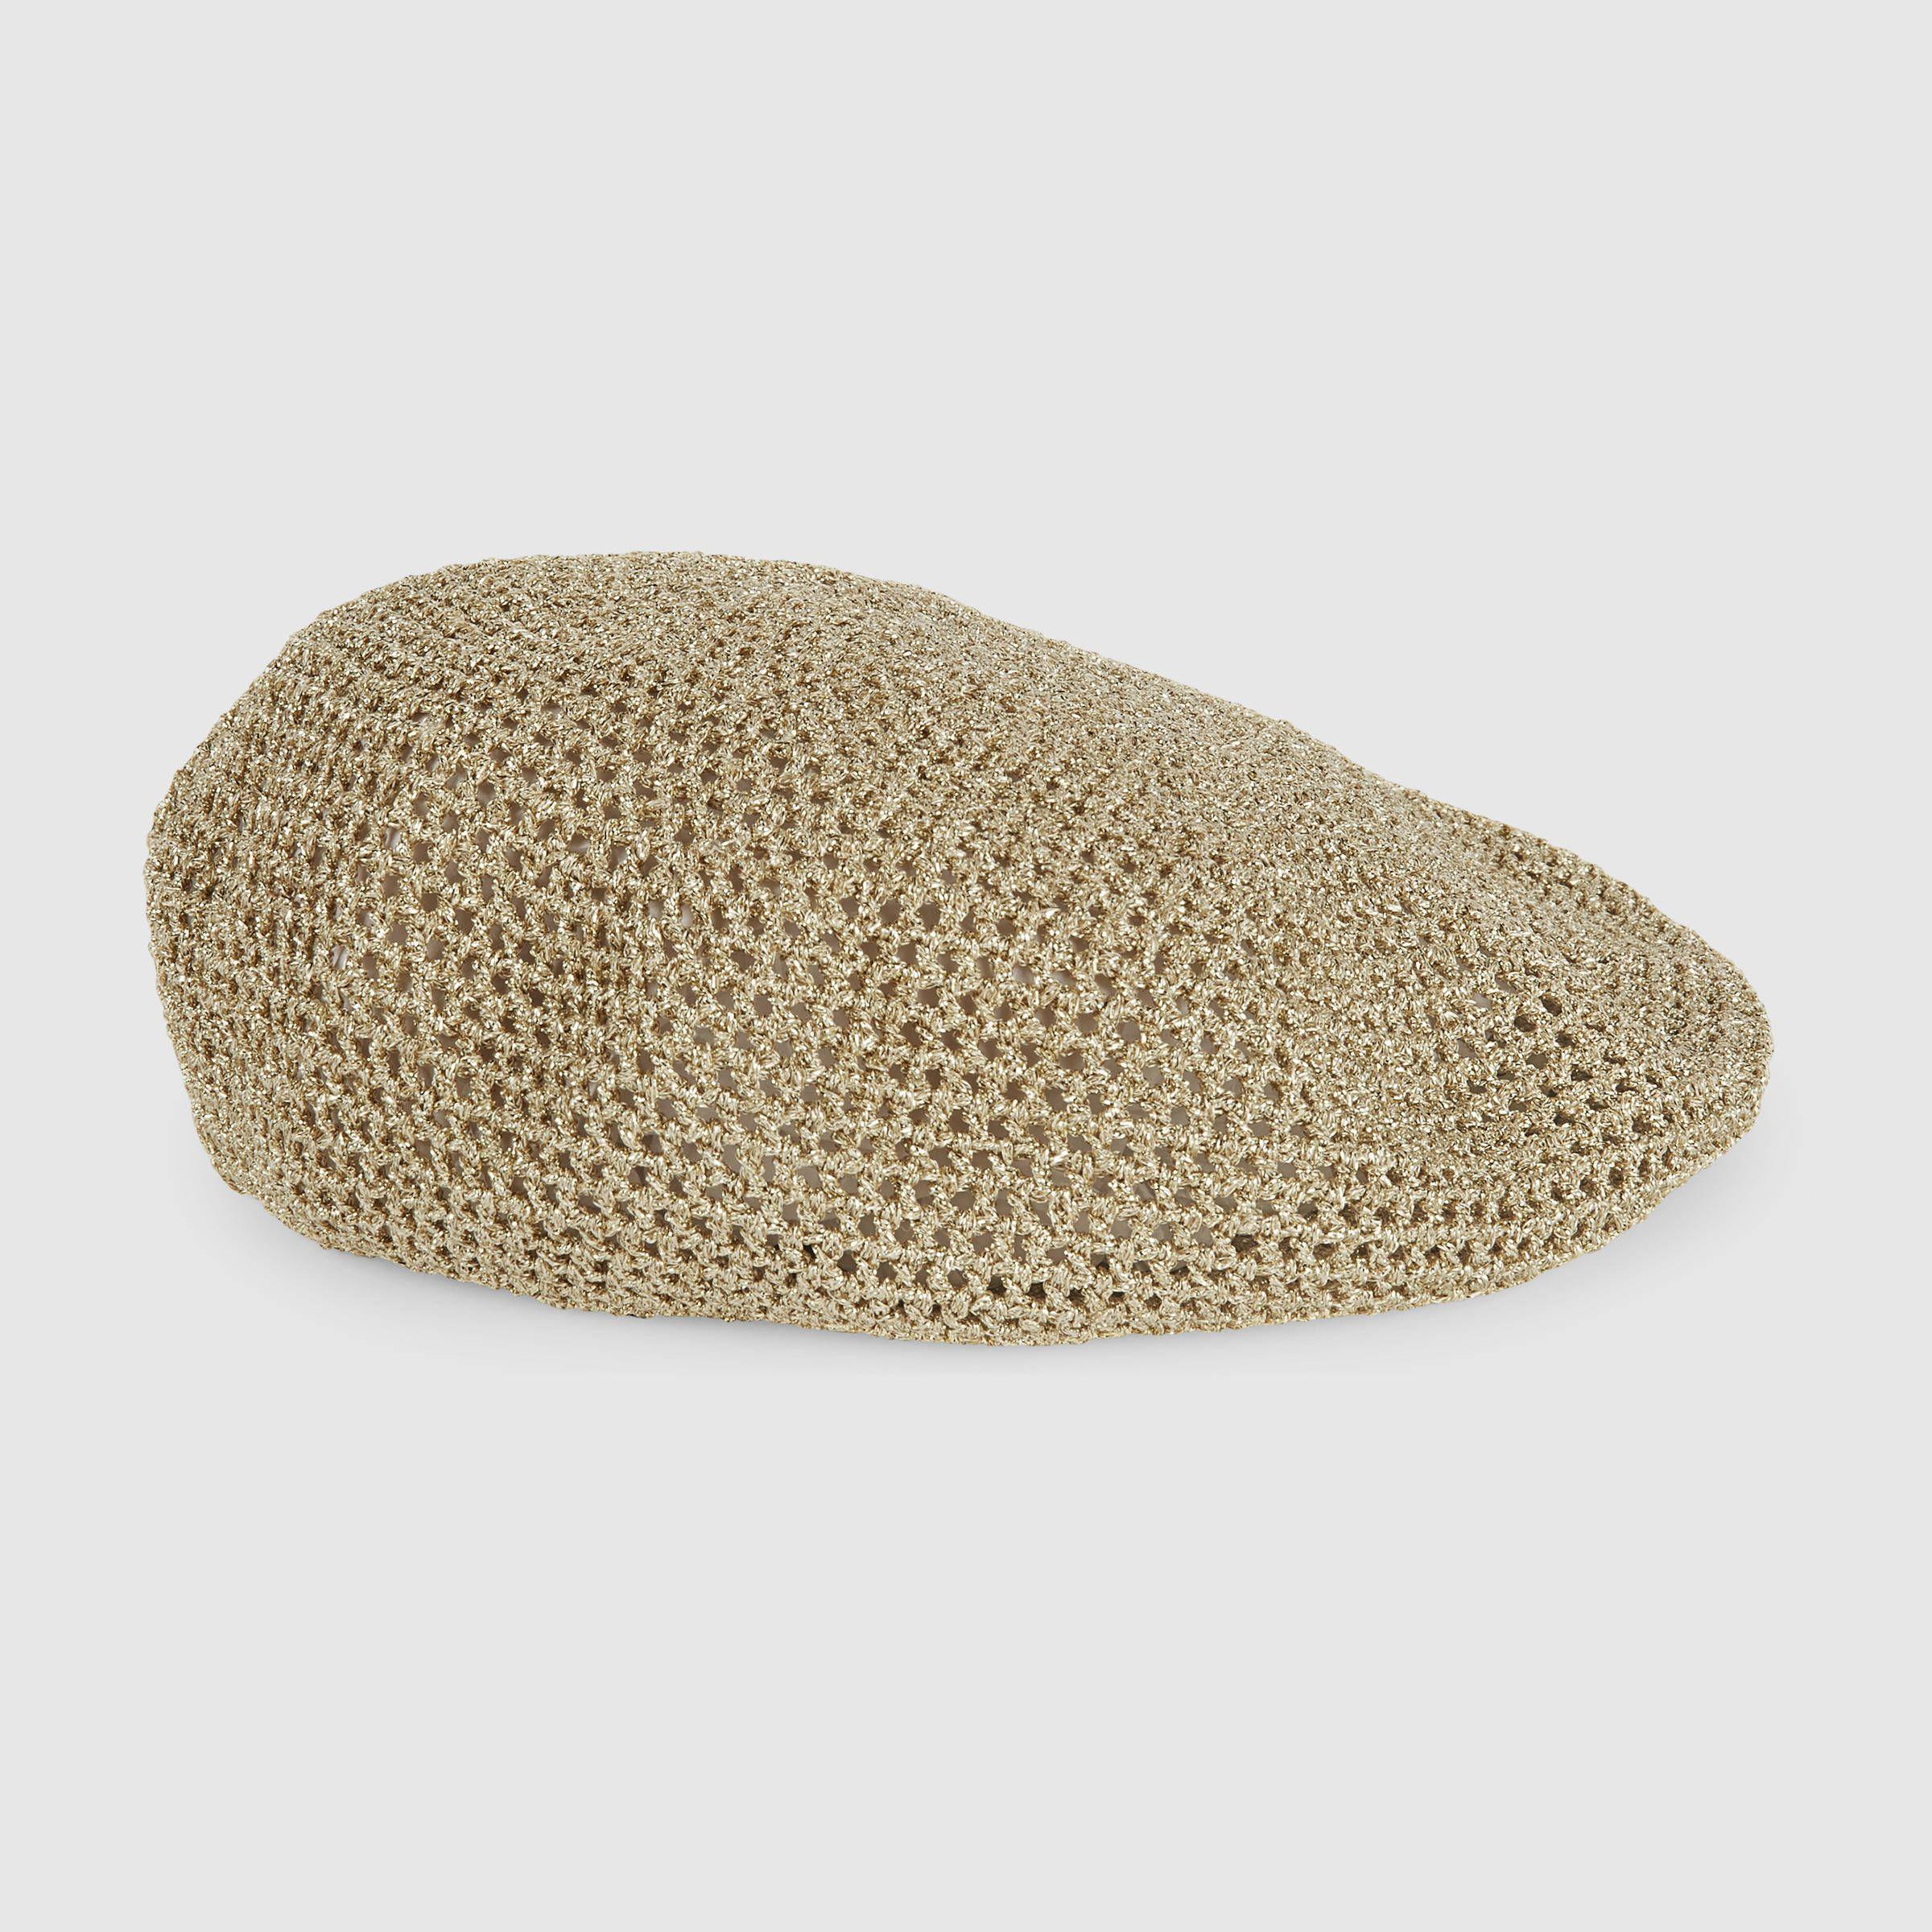 Gucci Women - Gucci Champagne Knit lurex hat -  465.00  c2aa39a4f5a